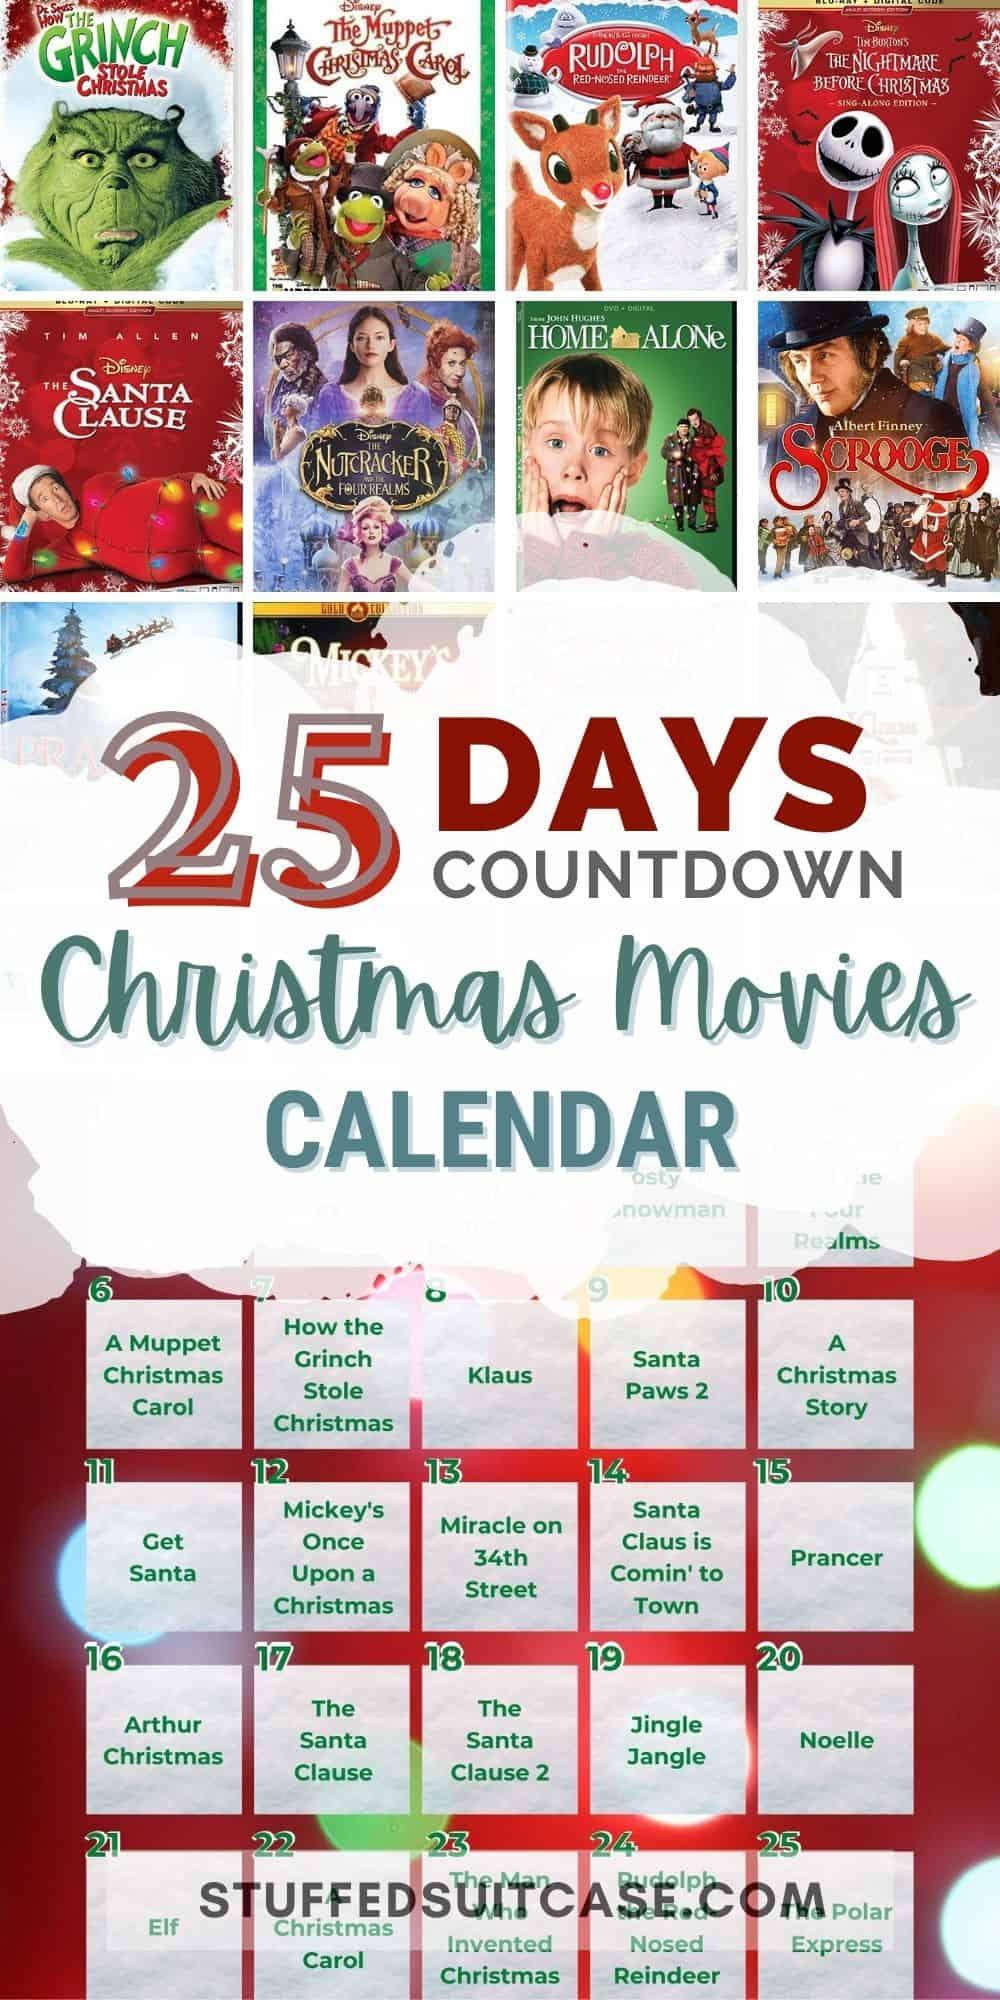 christmas movies for kids calendar pinterest image